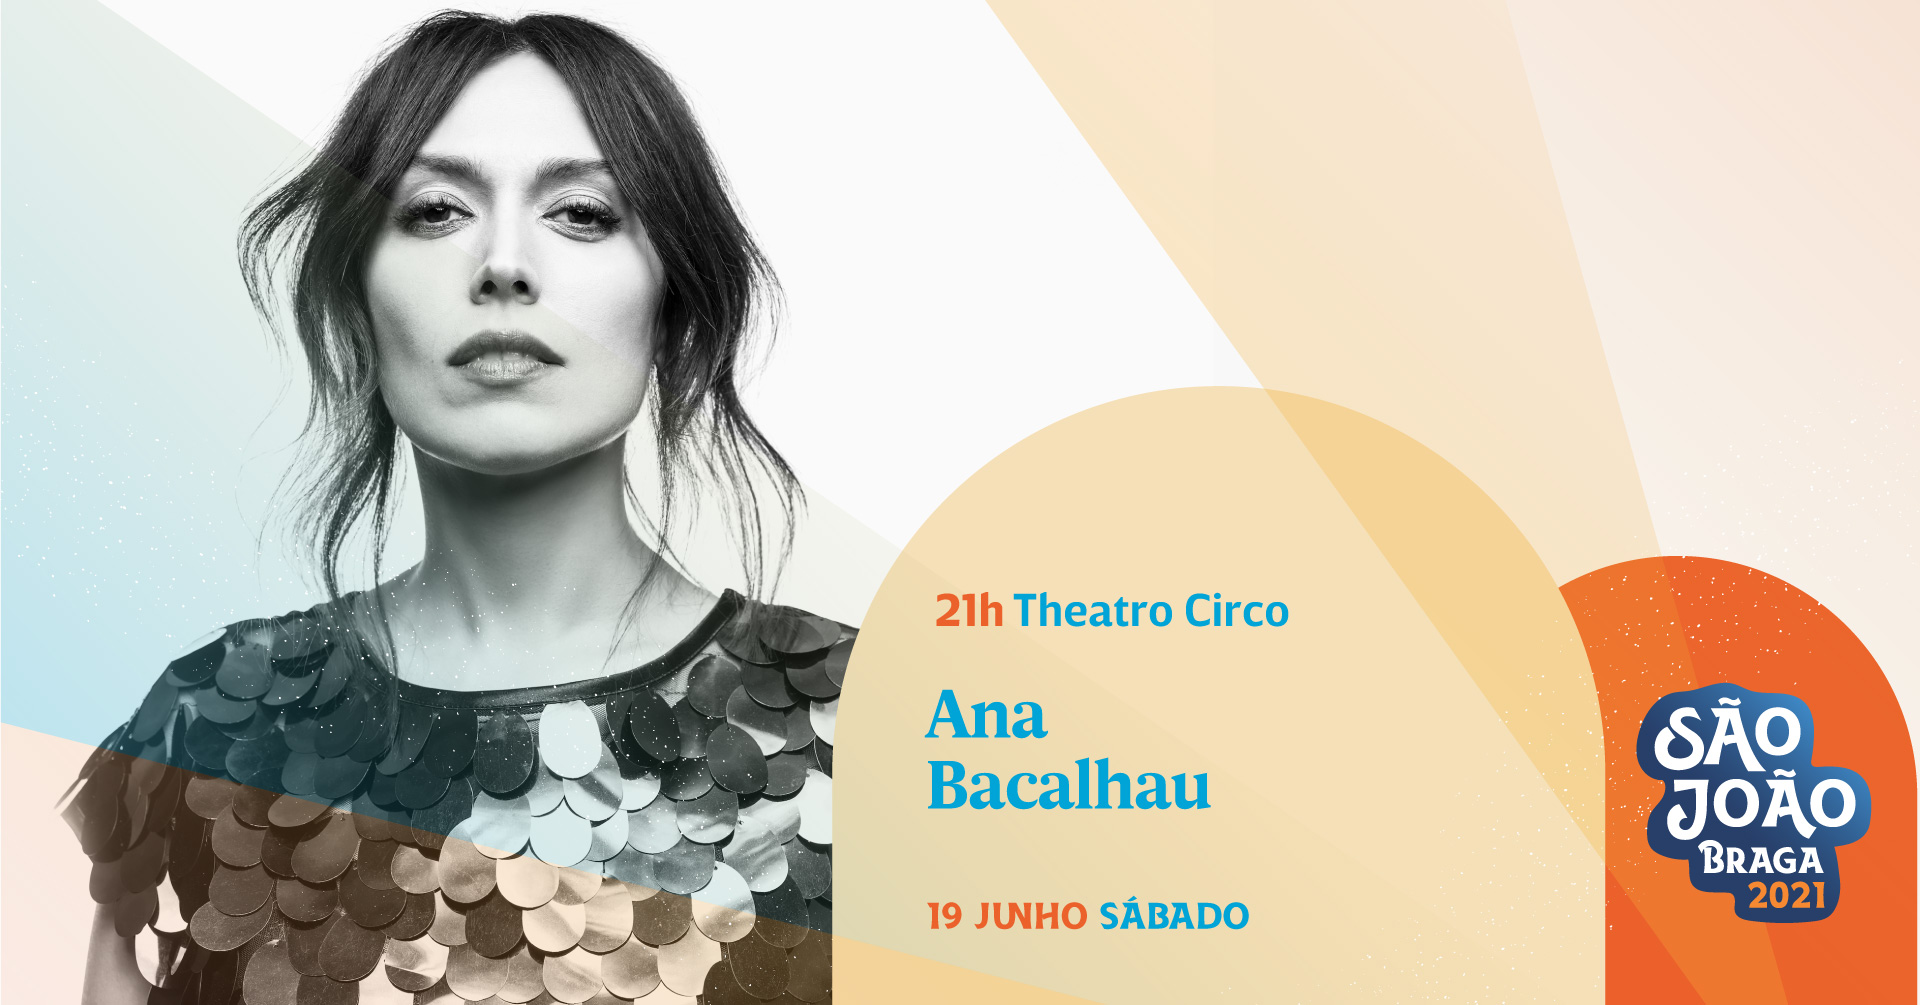 Ana Bacalhau - Braga